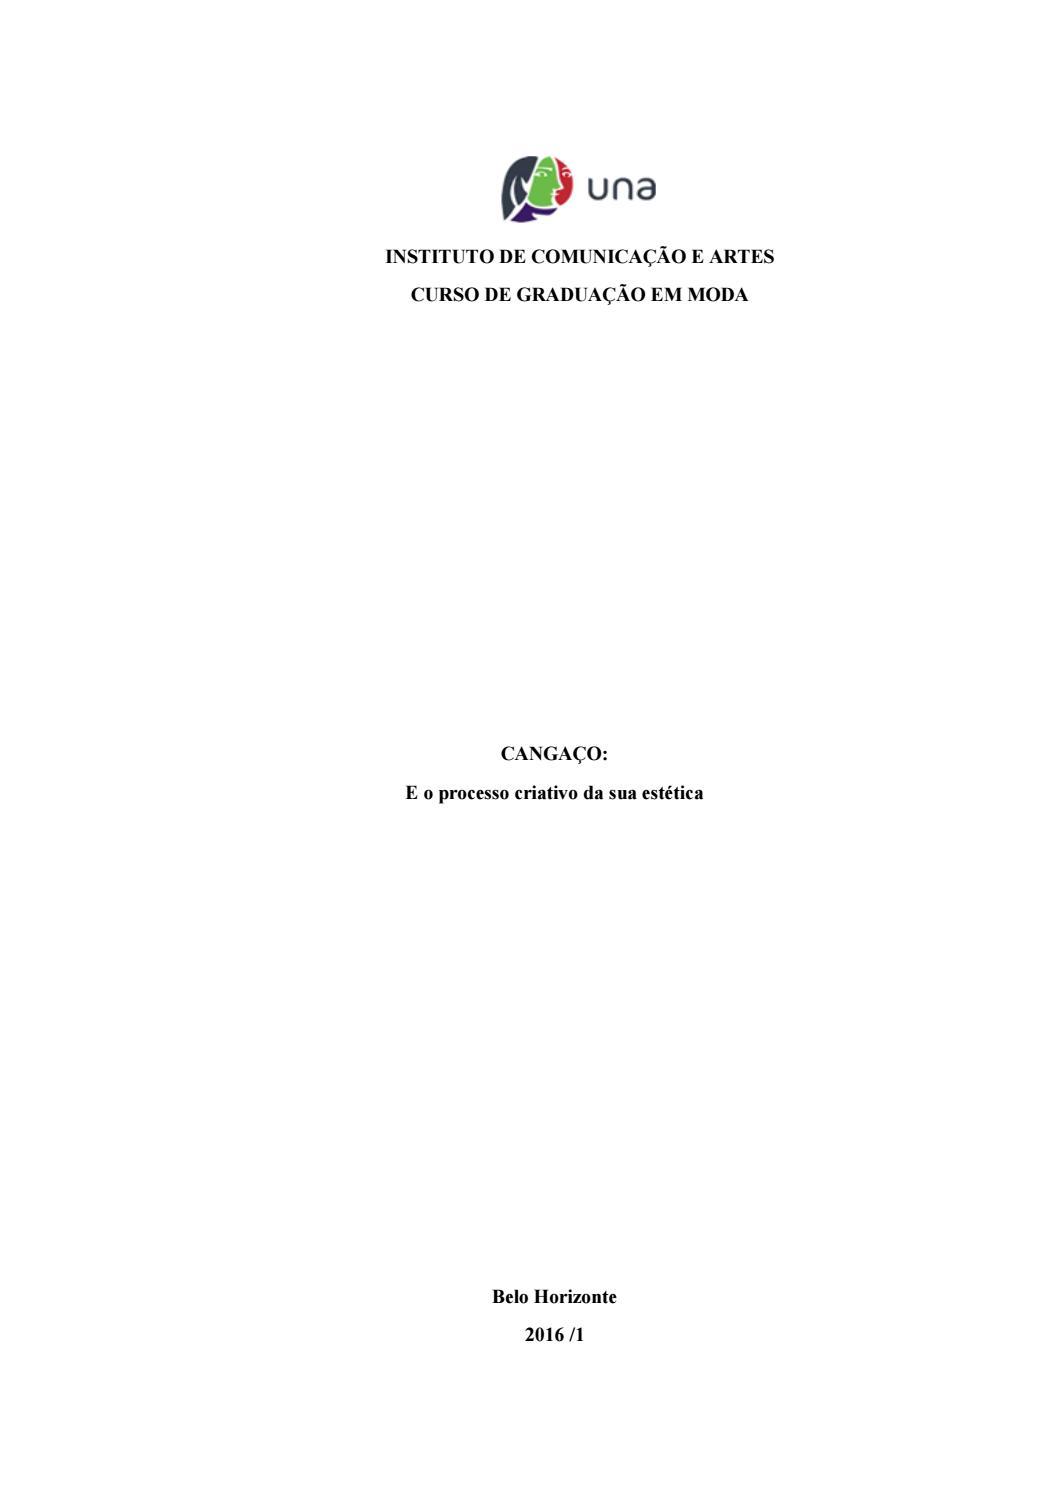 ad85c286d2 ANDAIRA FELICIANO - Monografia by Una Trendsetters - issuu